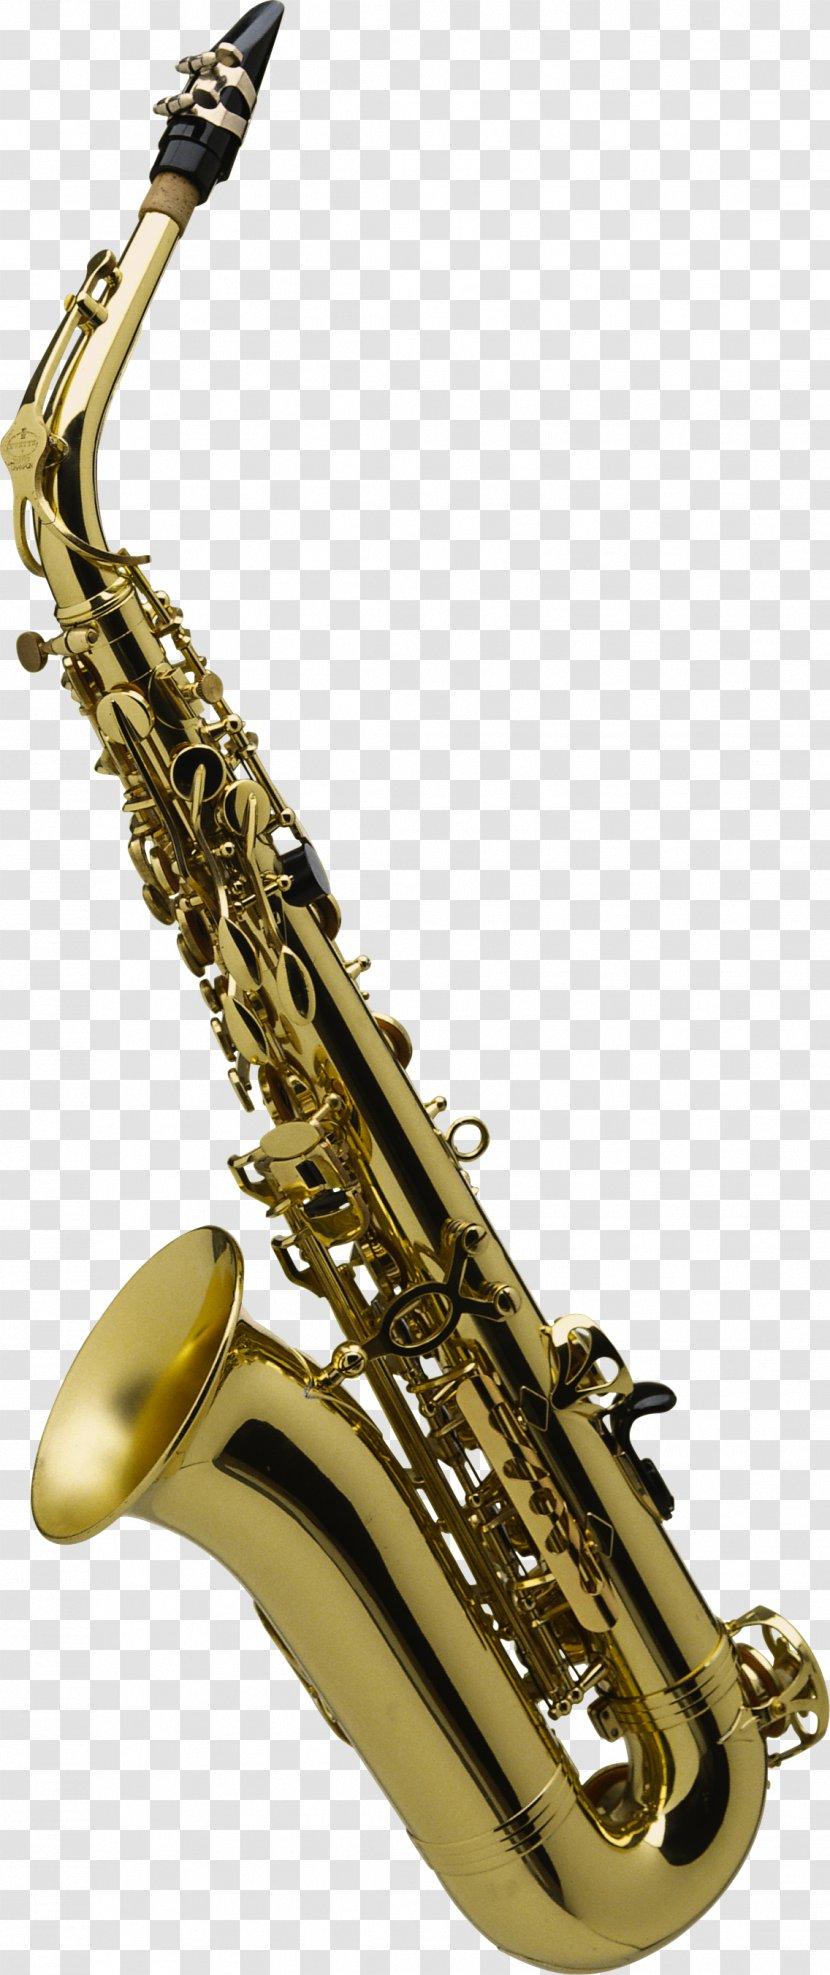 Musical Instruments Trumpet Image Clip Art Saxophone - Heart Transparent PNG